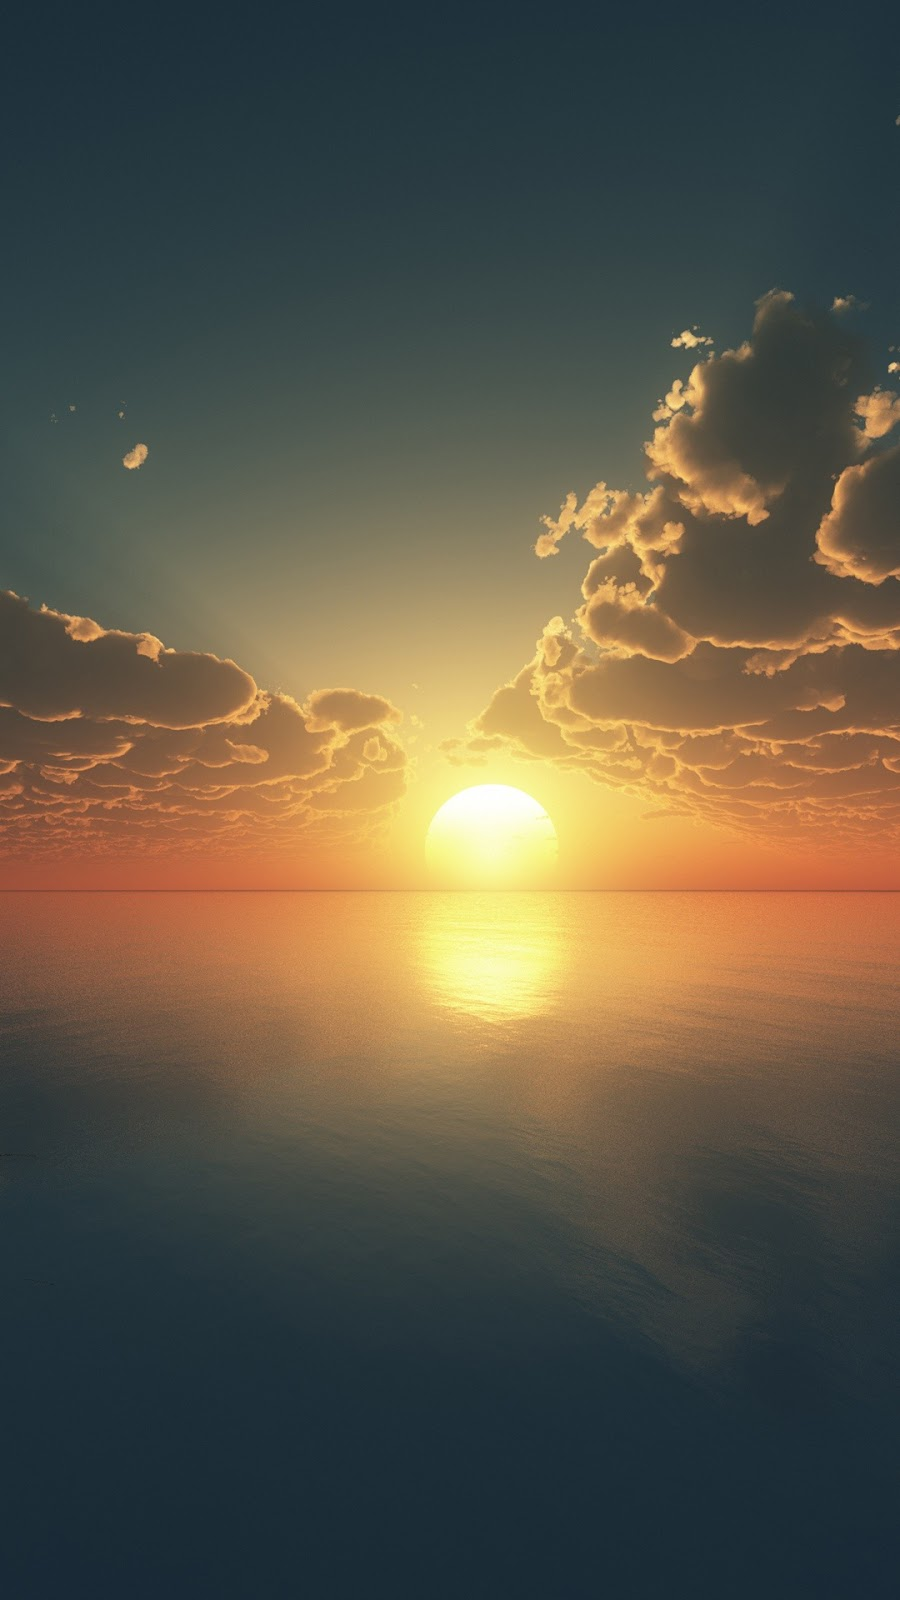 Mặt trời lặn trên biển